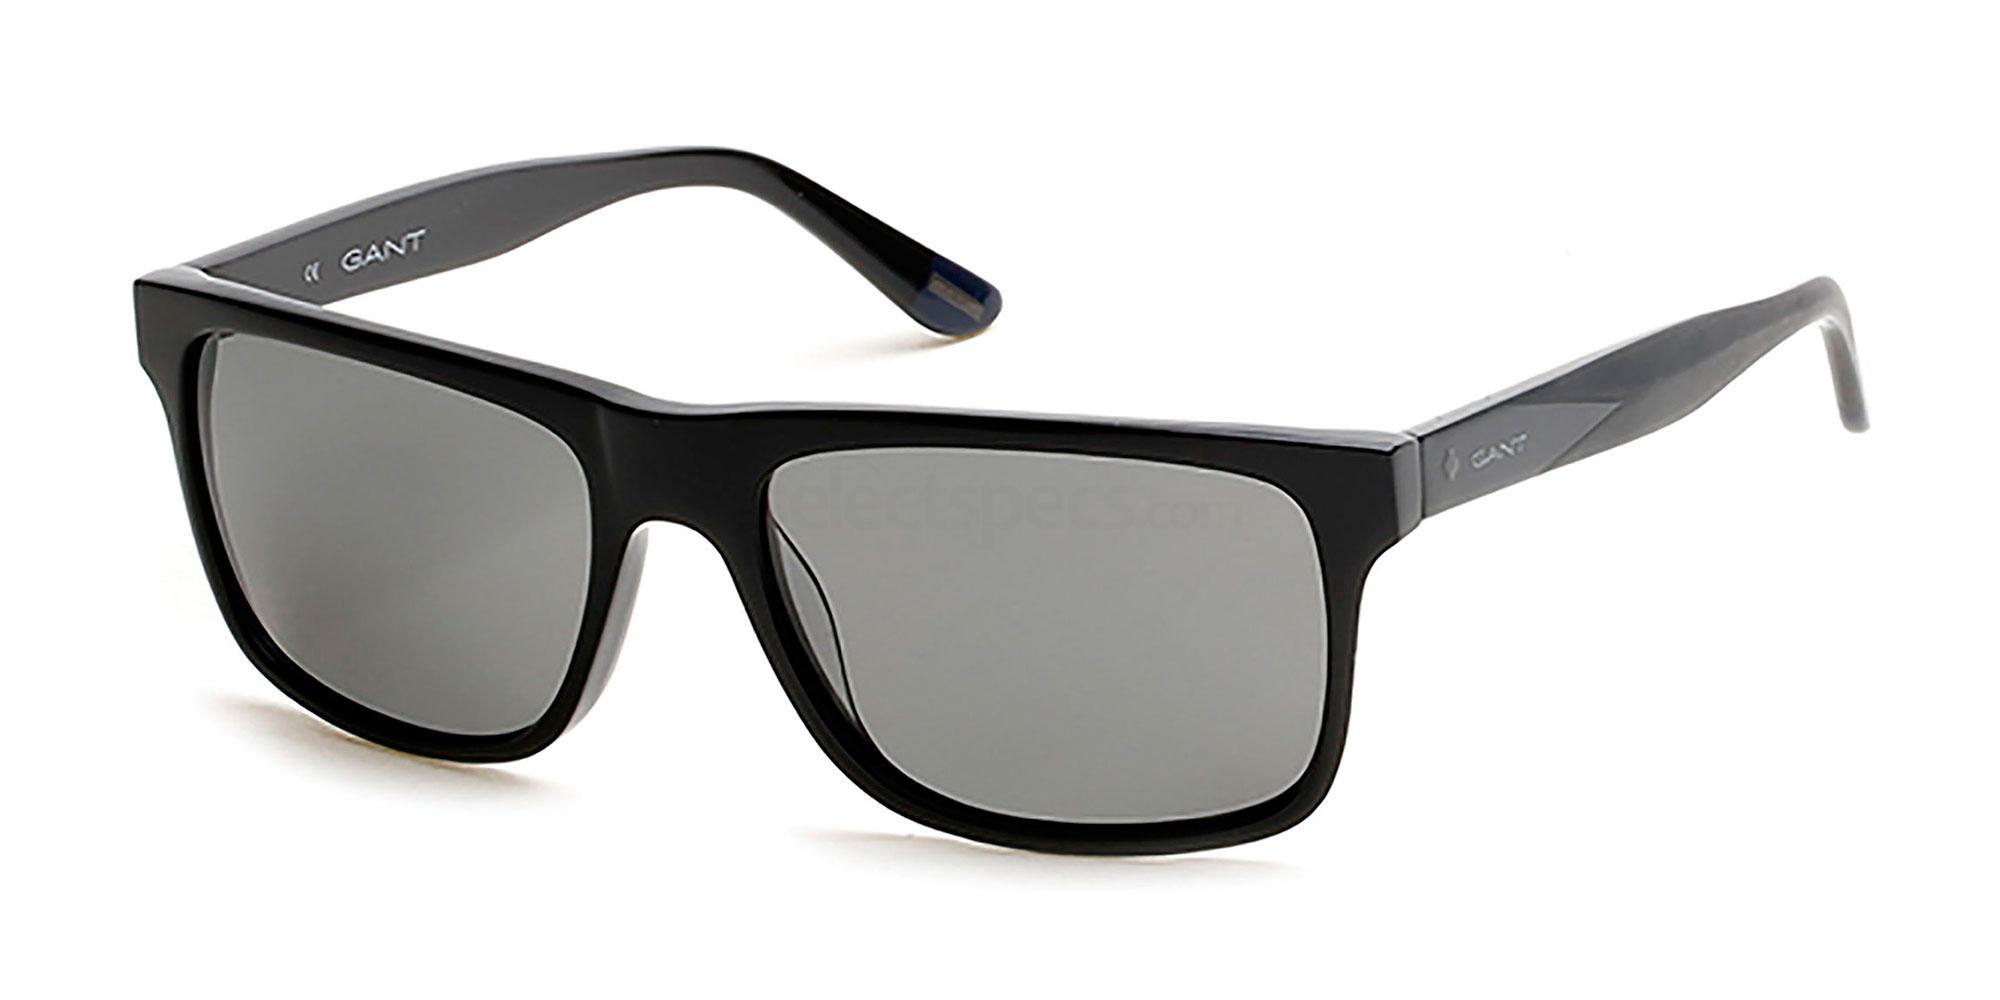 01D GA7041 Sunglasses, Gant